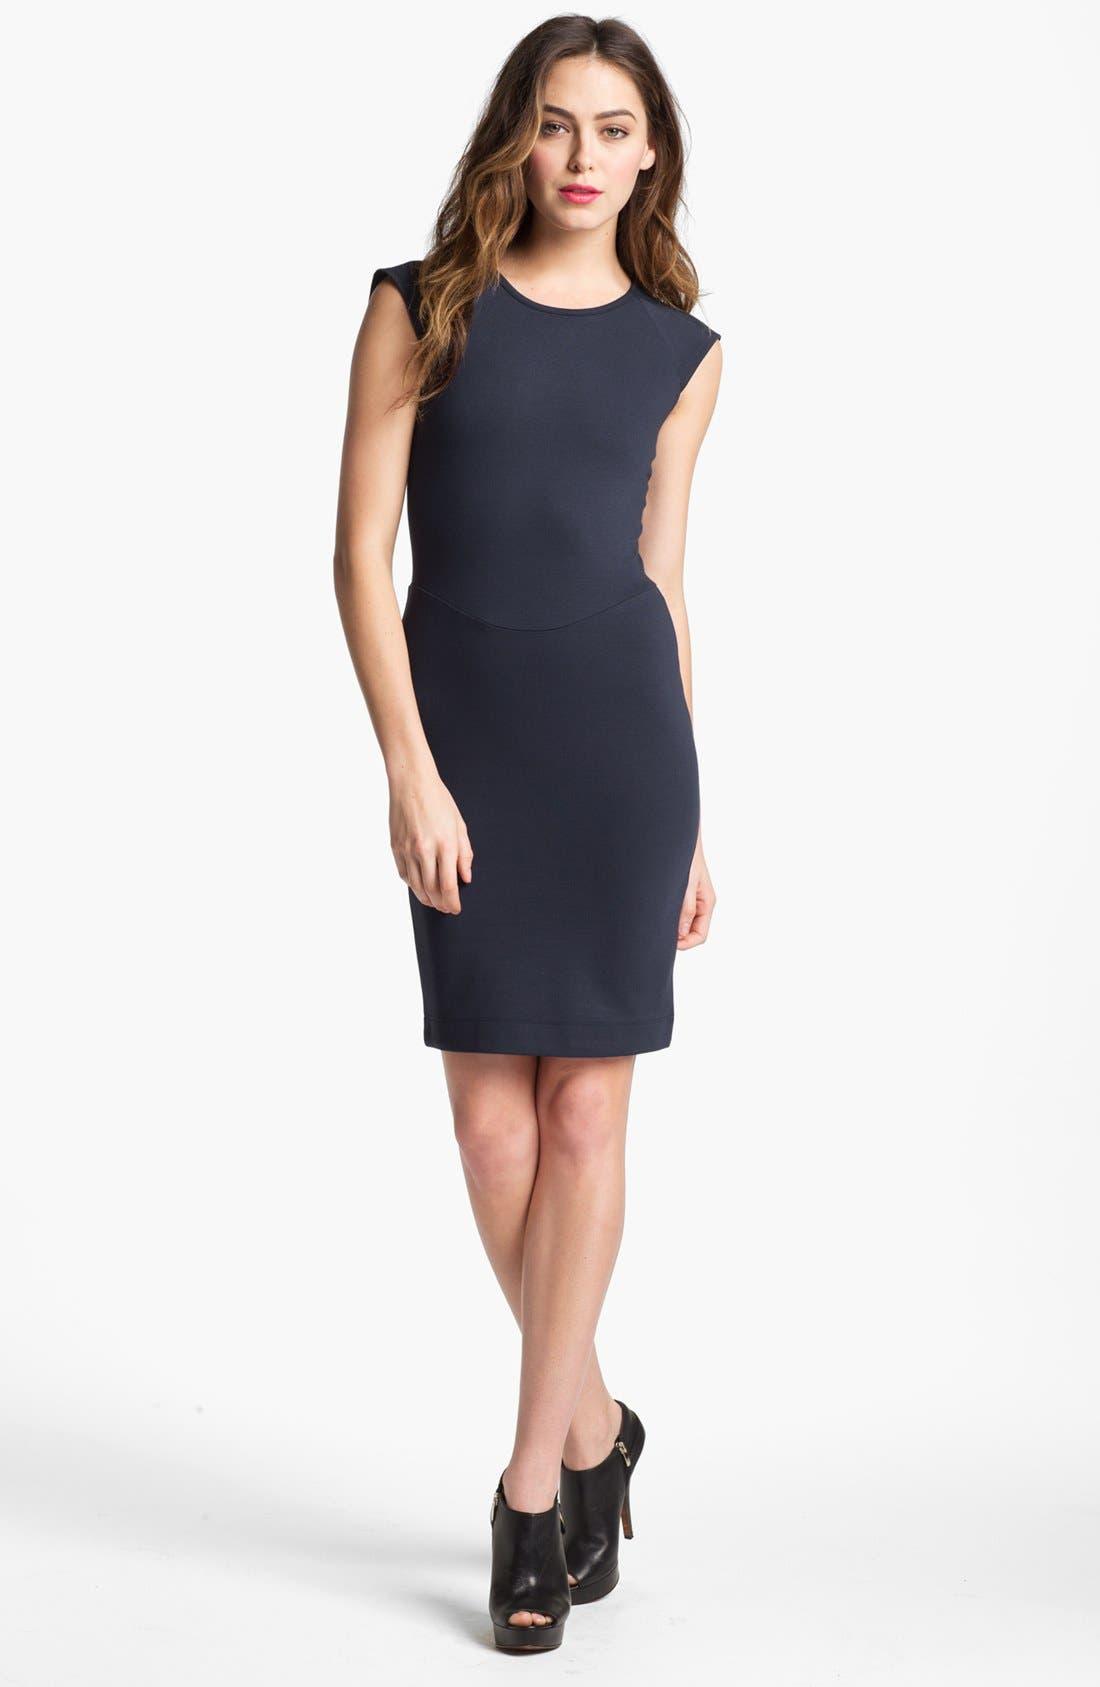 Main Image - French Connection 'Dani' Lace Back Jersey Dress